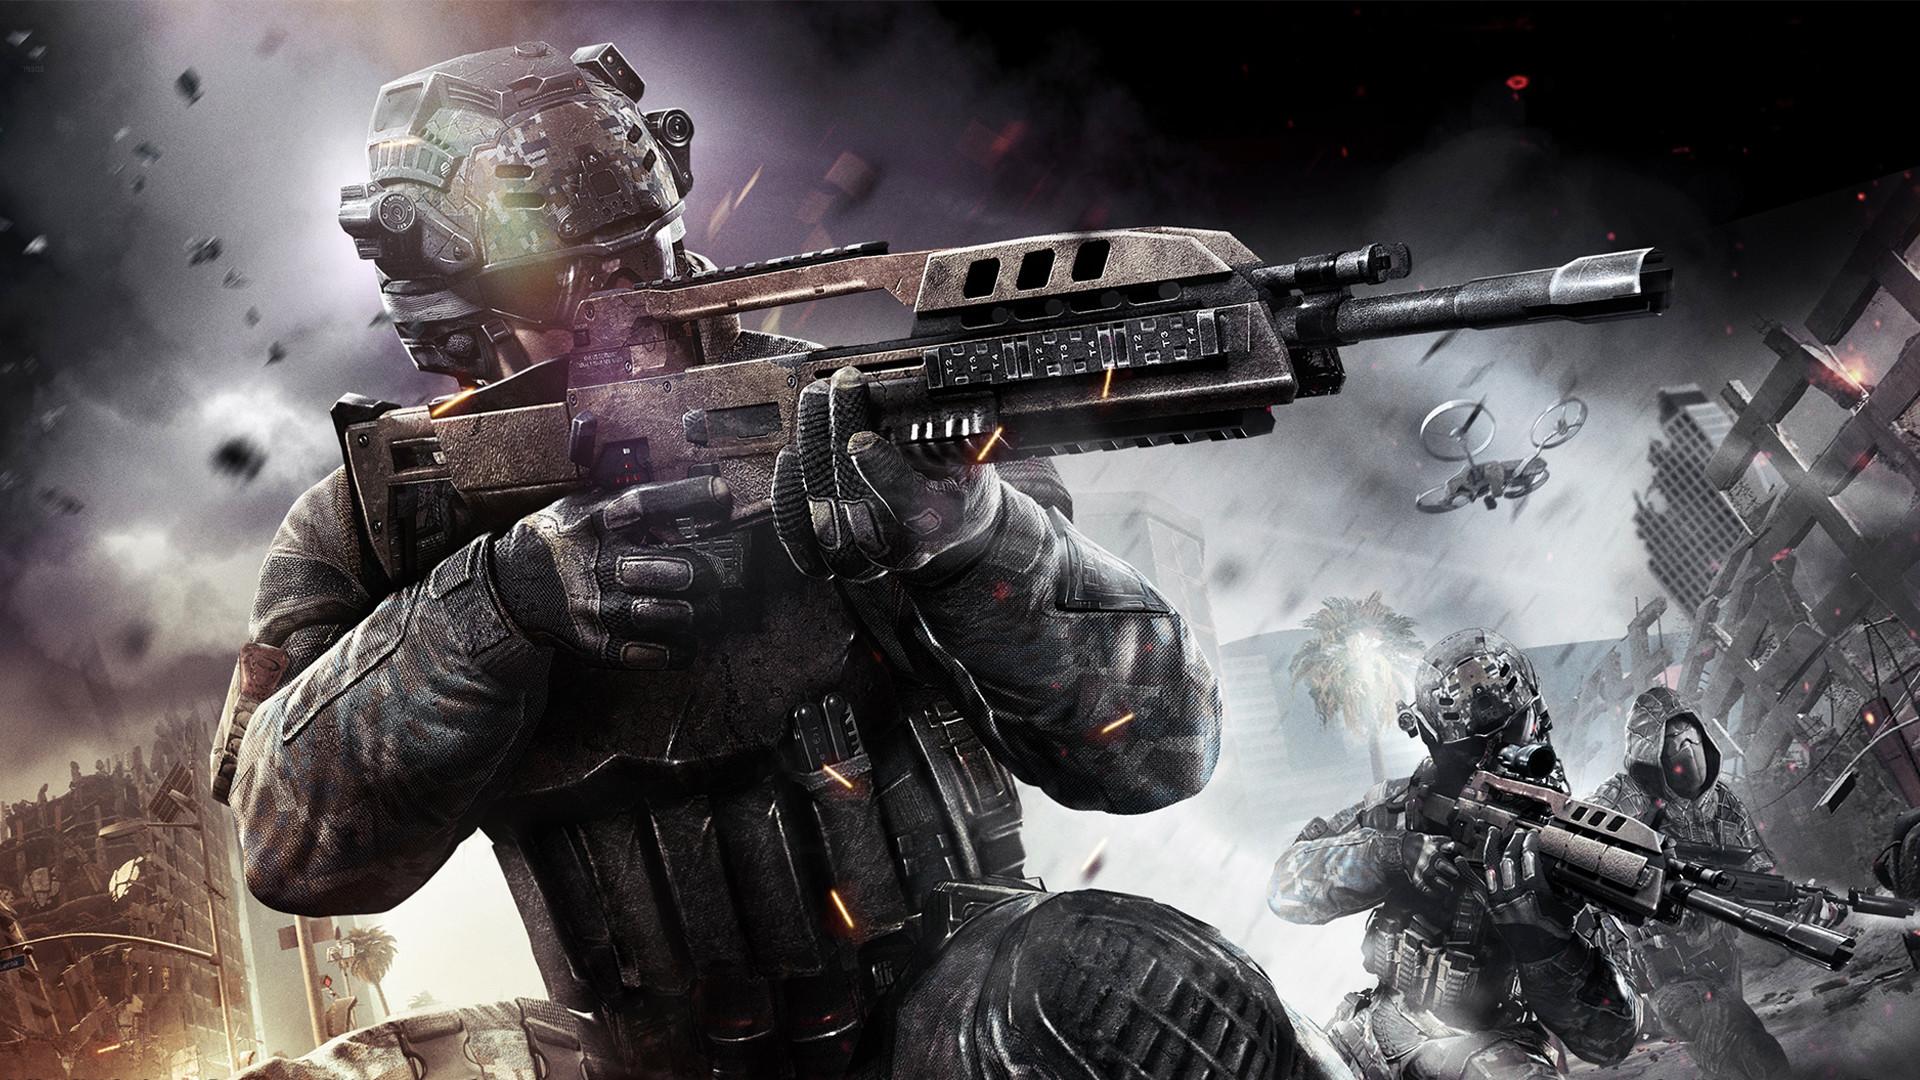 Black Ops 2 Origins Wallpaper 88 Images